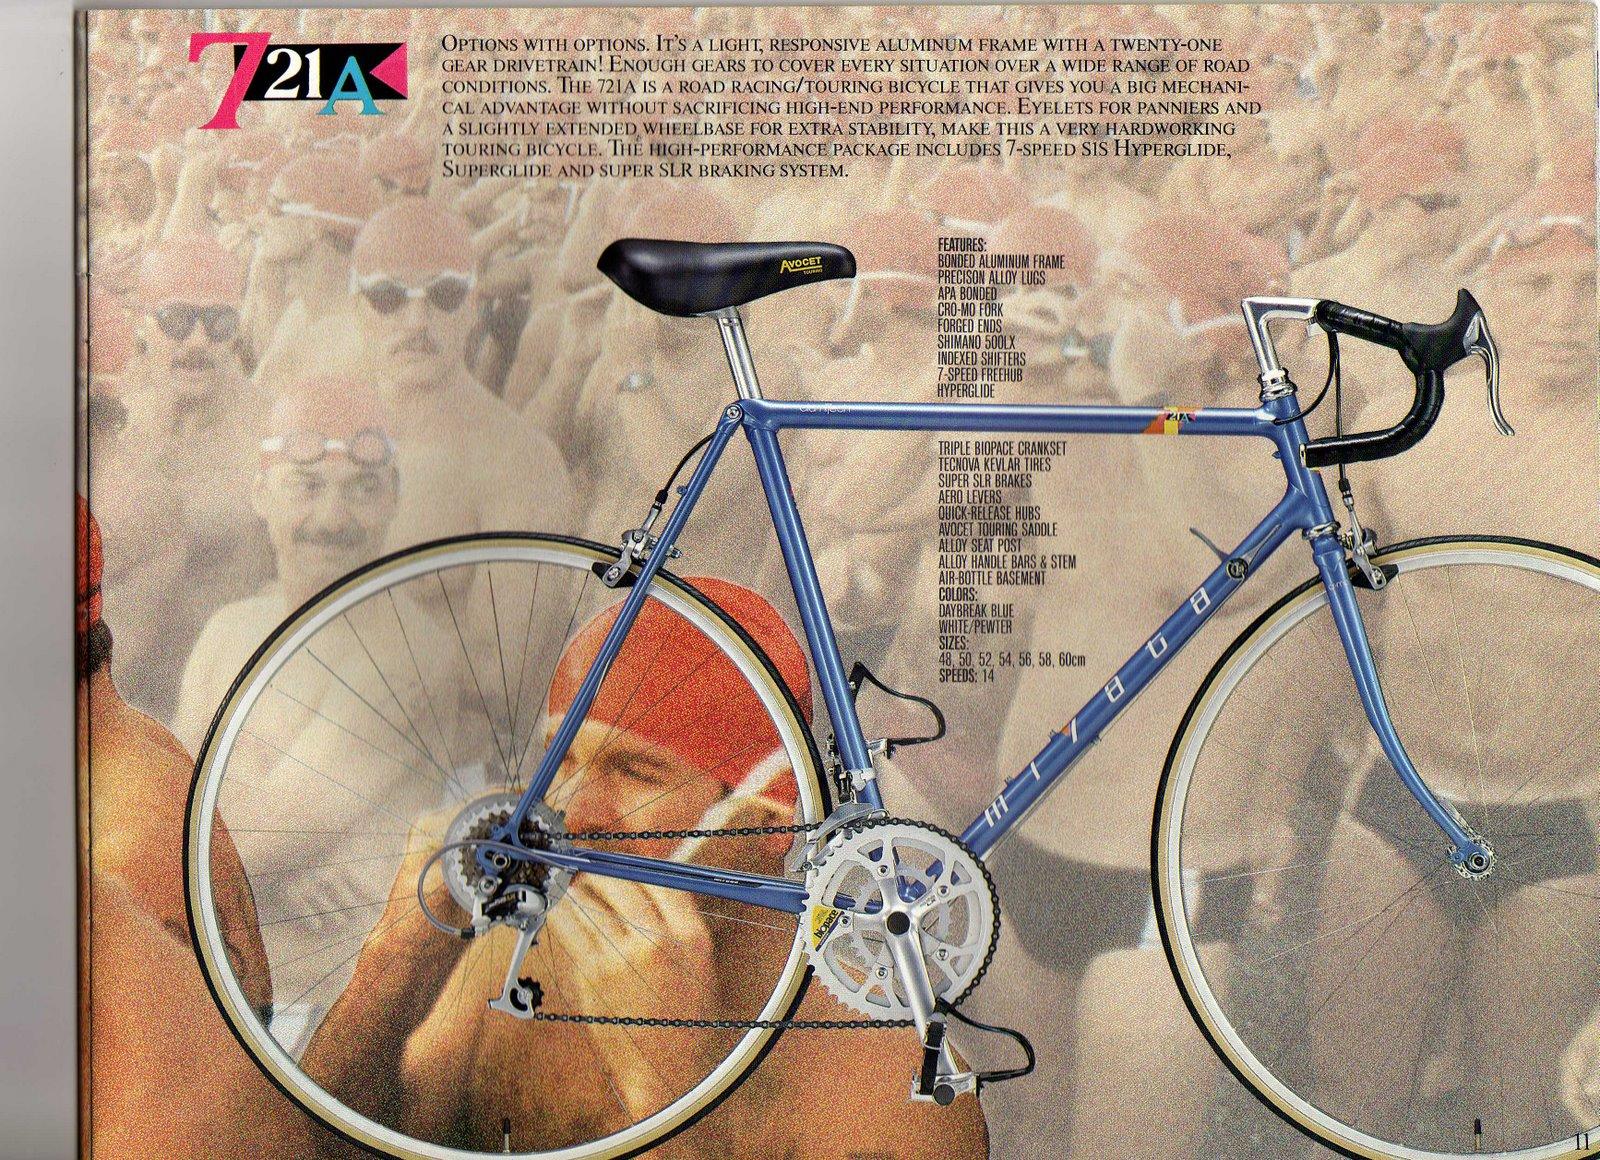 1990 Miyata 721A - Bike Forums